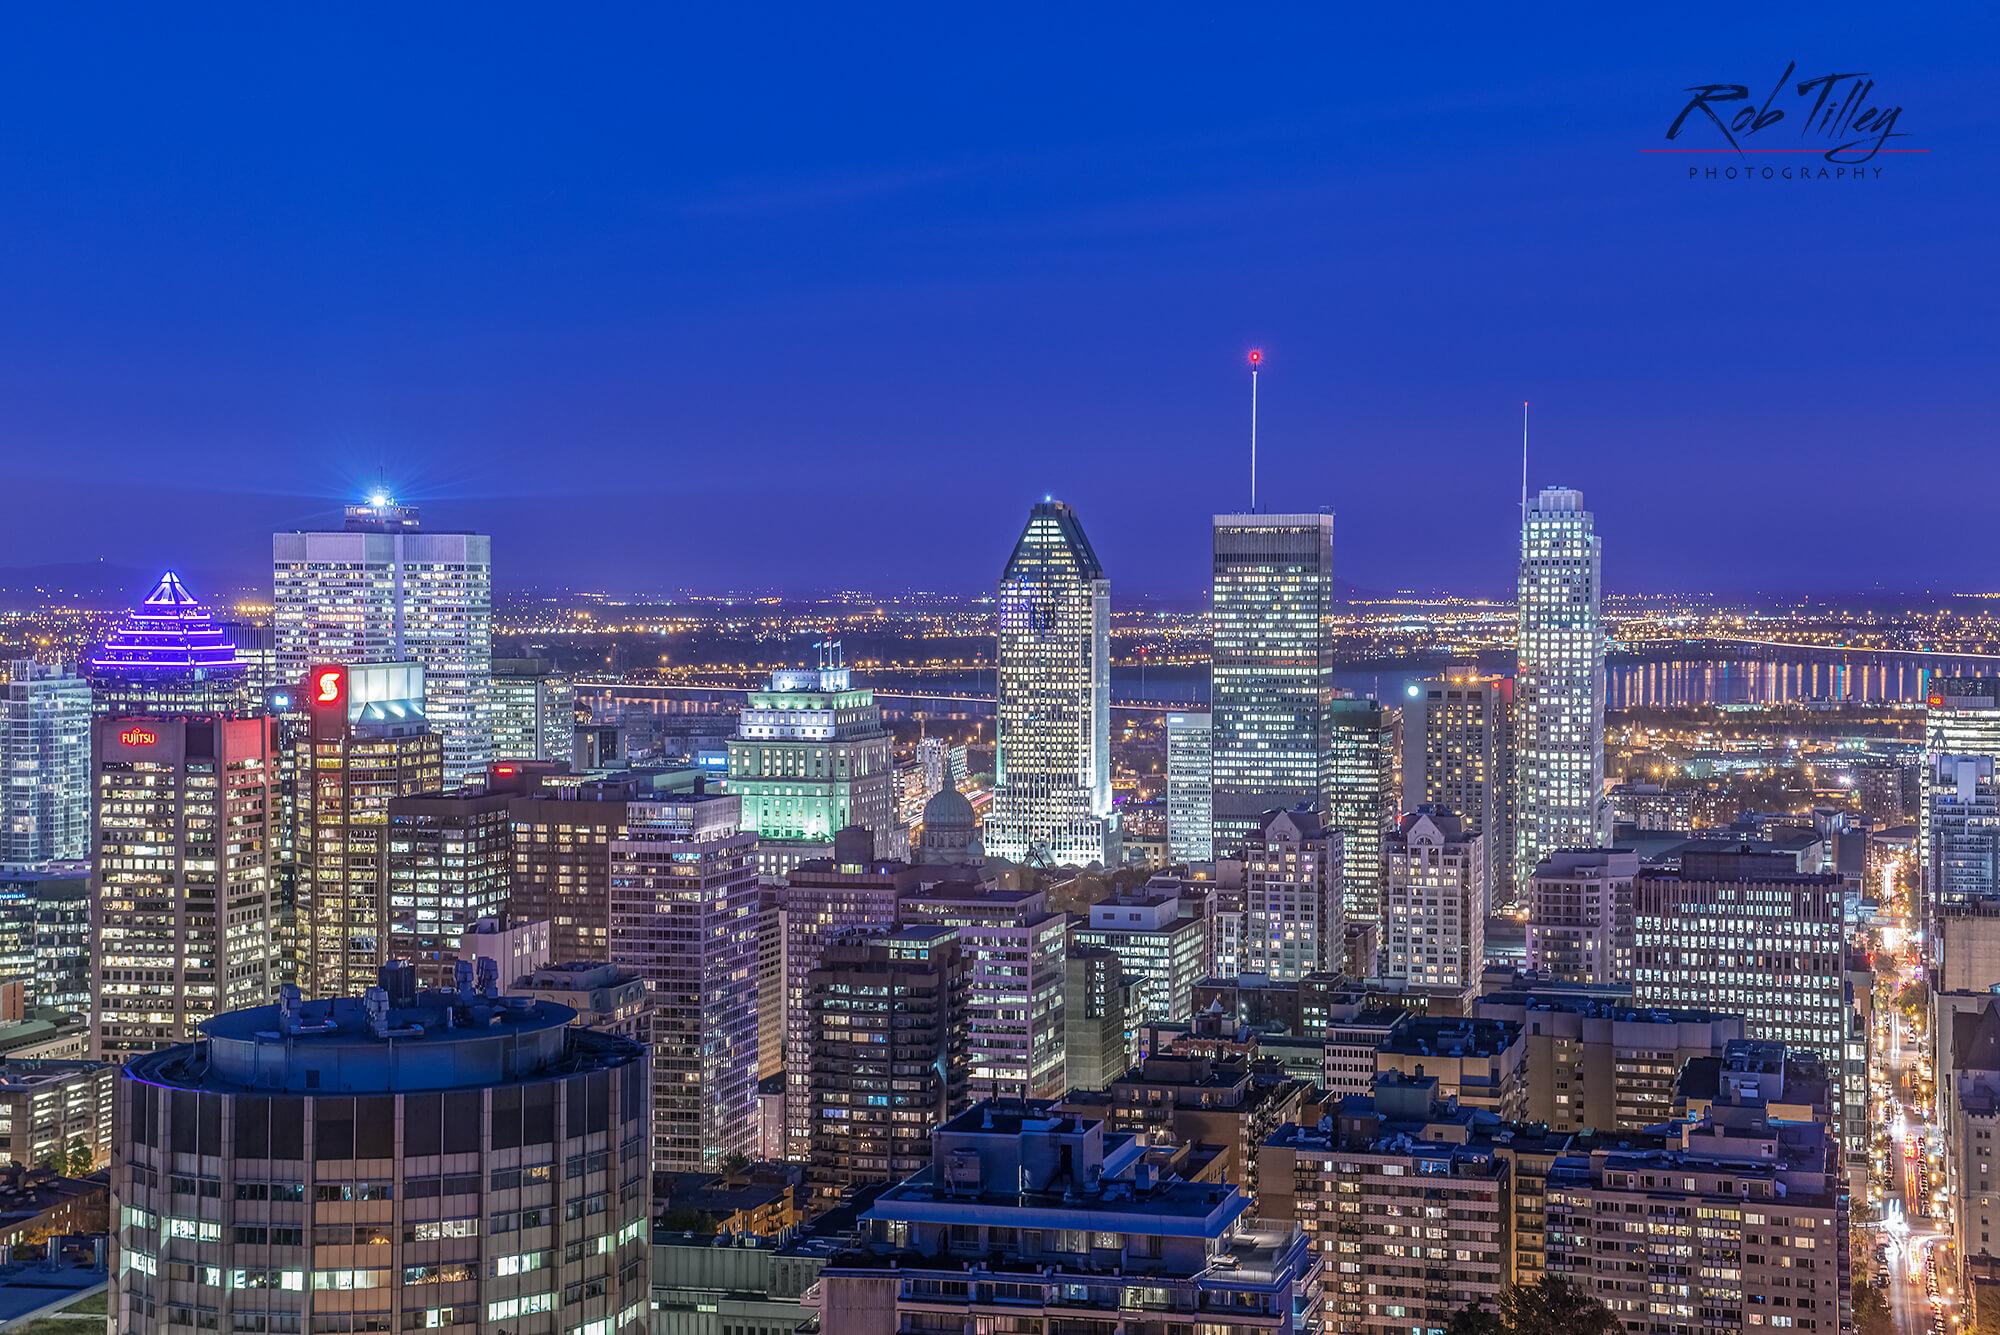 Twilight Montreal